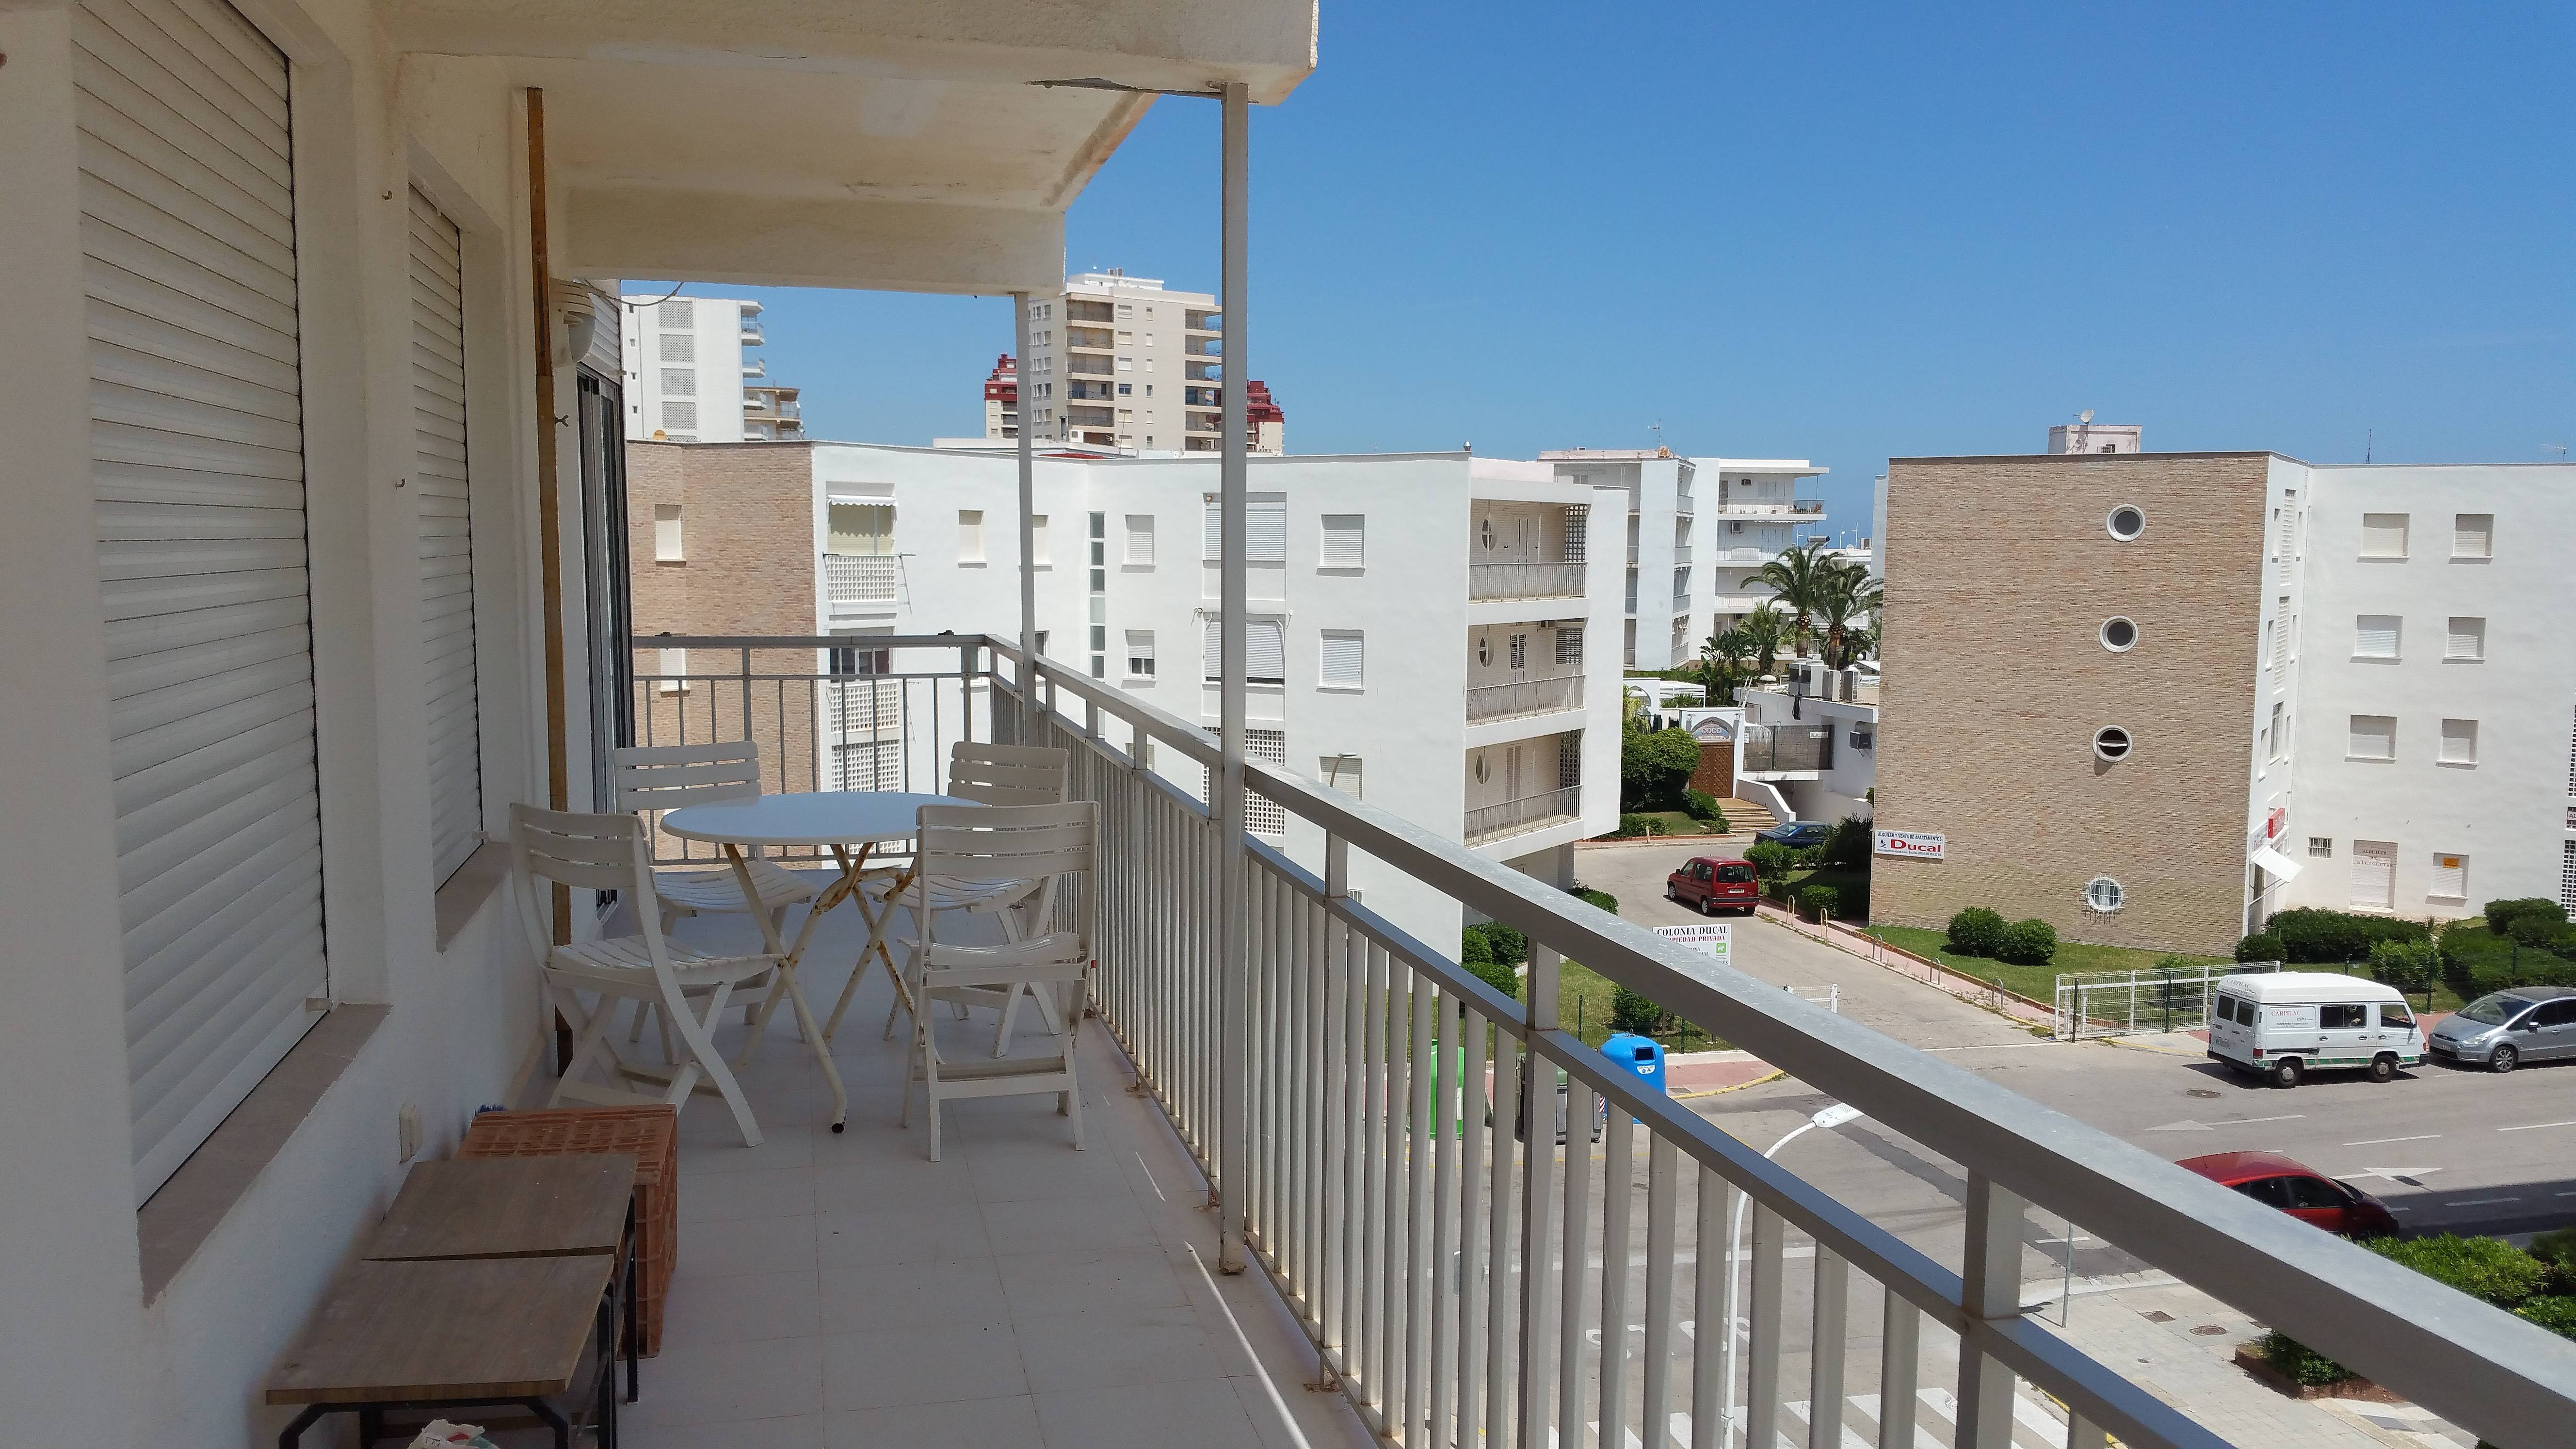 Apartamentos playa de gandia alquiler de apartamentos en apartamento en alquiler a 50 m de la - Apartamentos baratos gandia ...